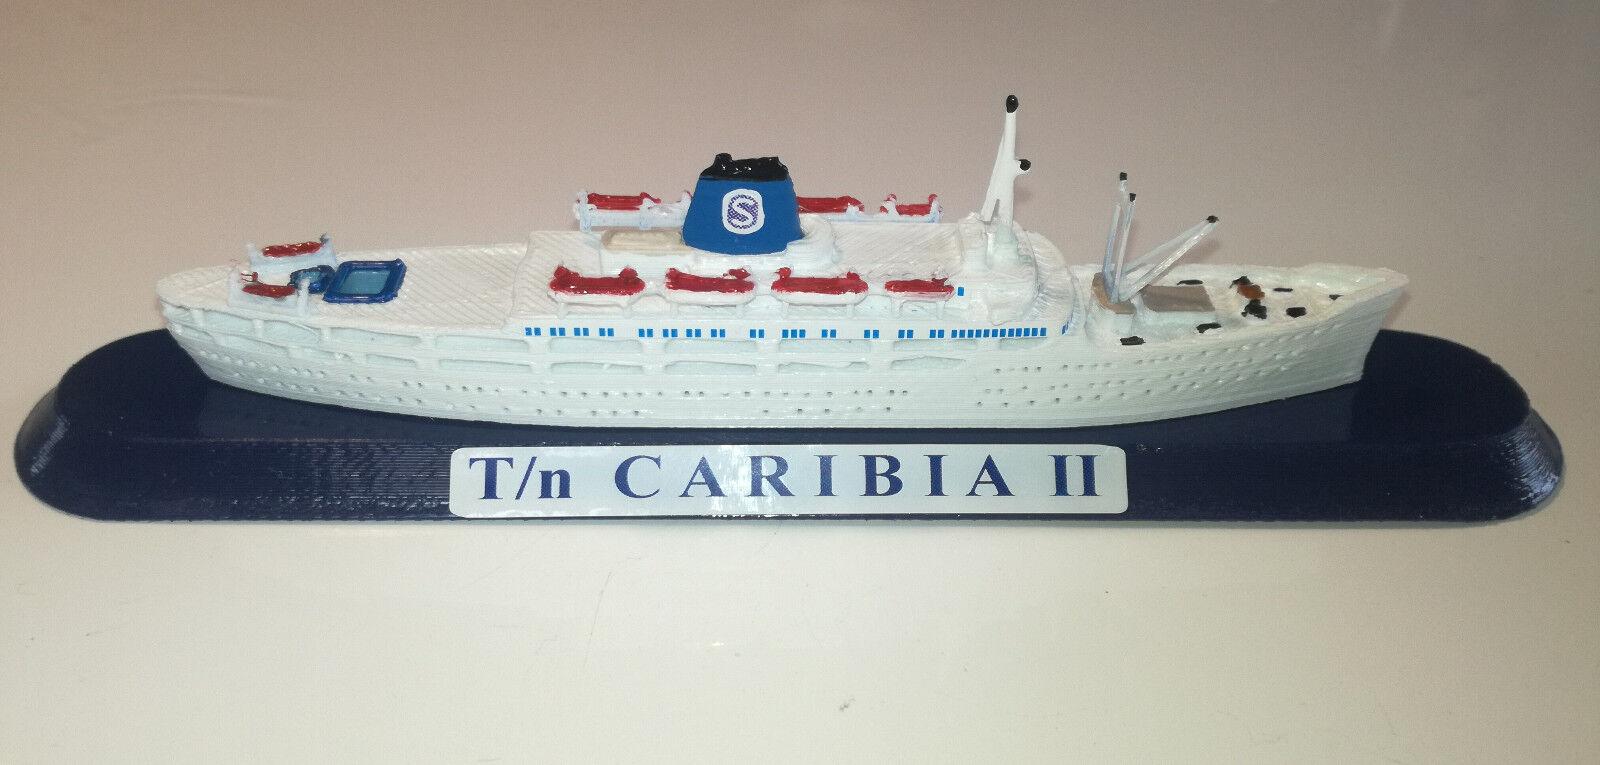 SIOSA  FRATELLI GRIMALDI ship CARIBIA 2 Ex. Roma Flotta Lauro model ship 1 1250